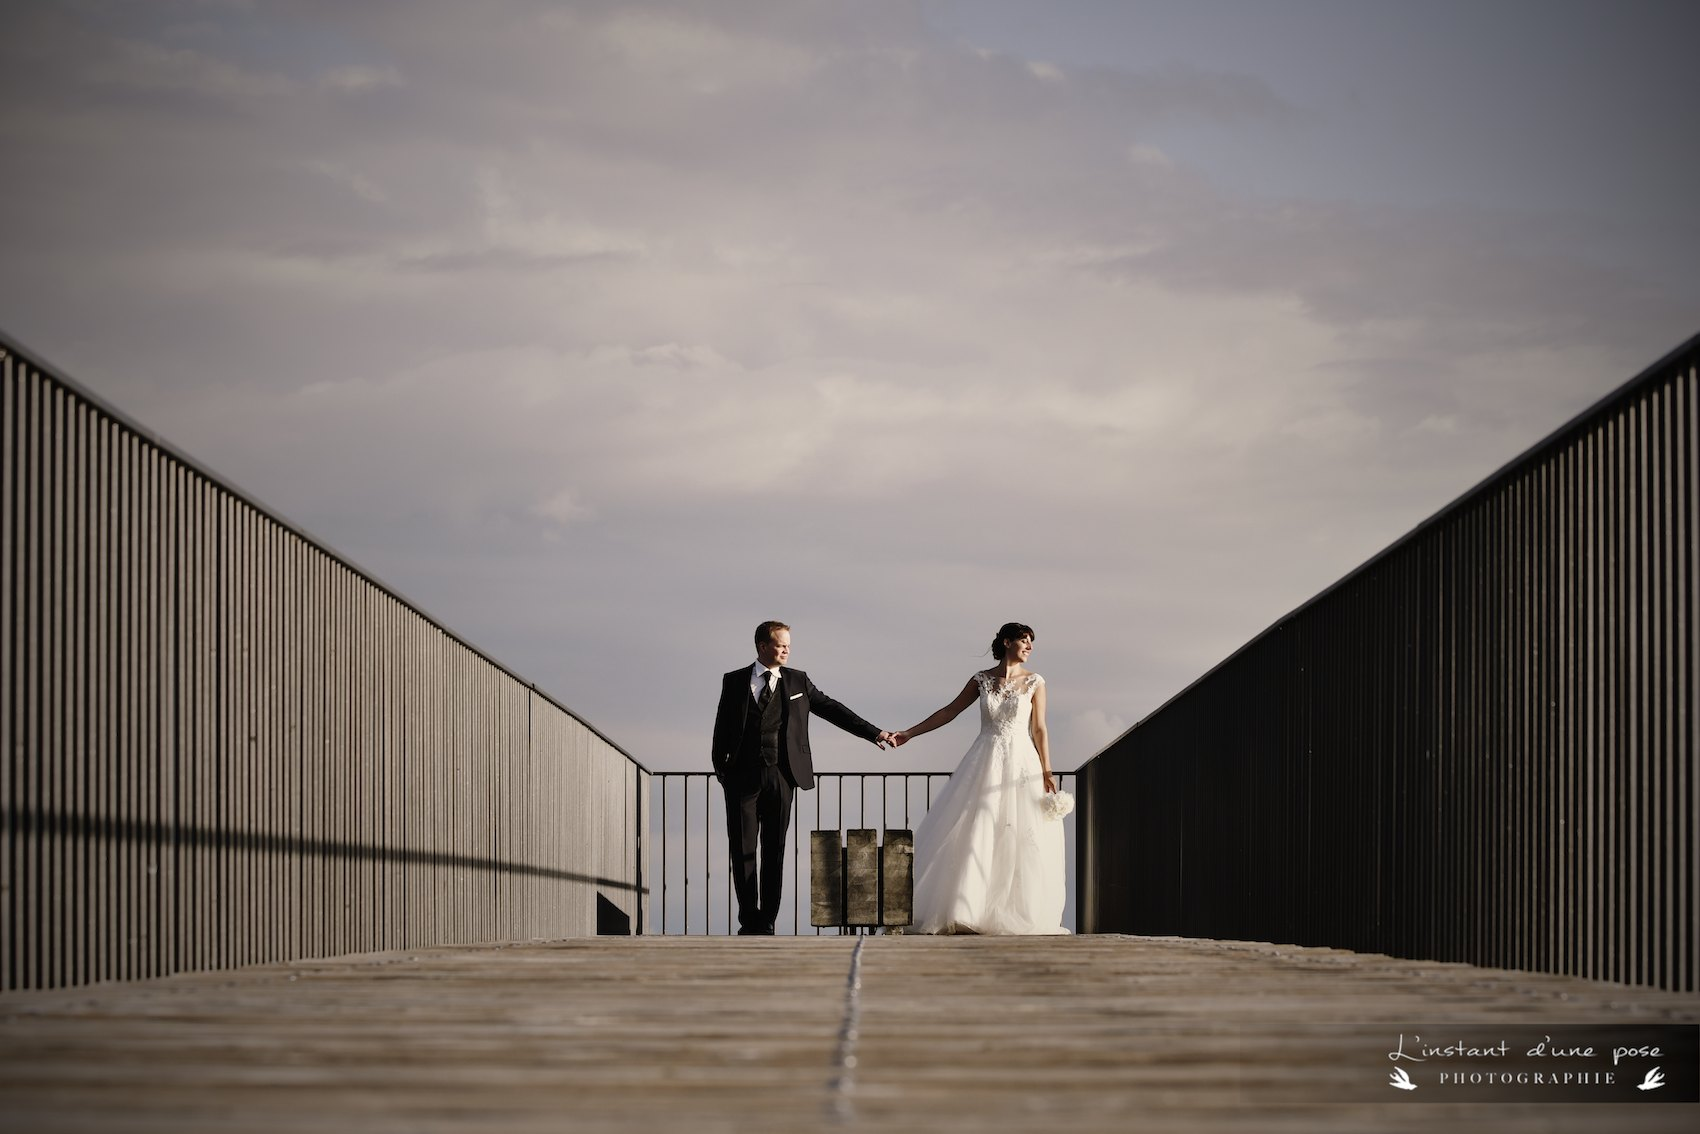 Joséphine & Arnaud